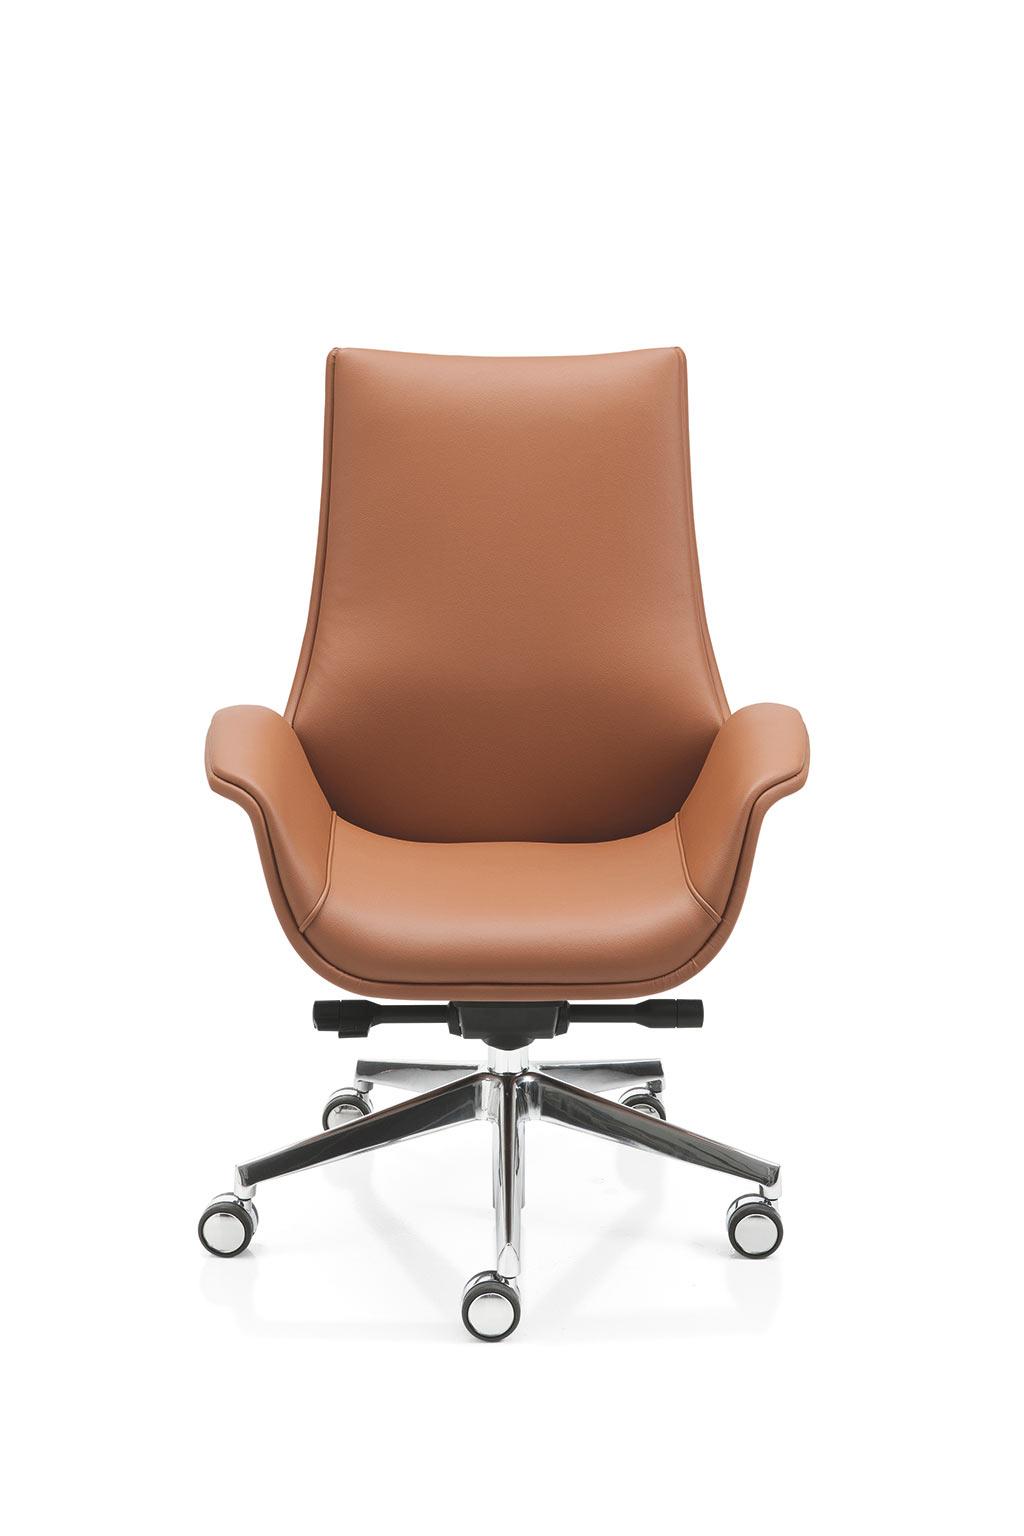 Kriteria toscana sedute da ufficio belardi arredamenti for Sedute da ufficio